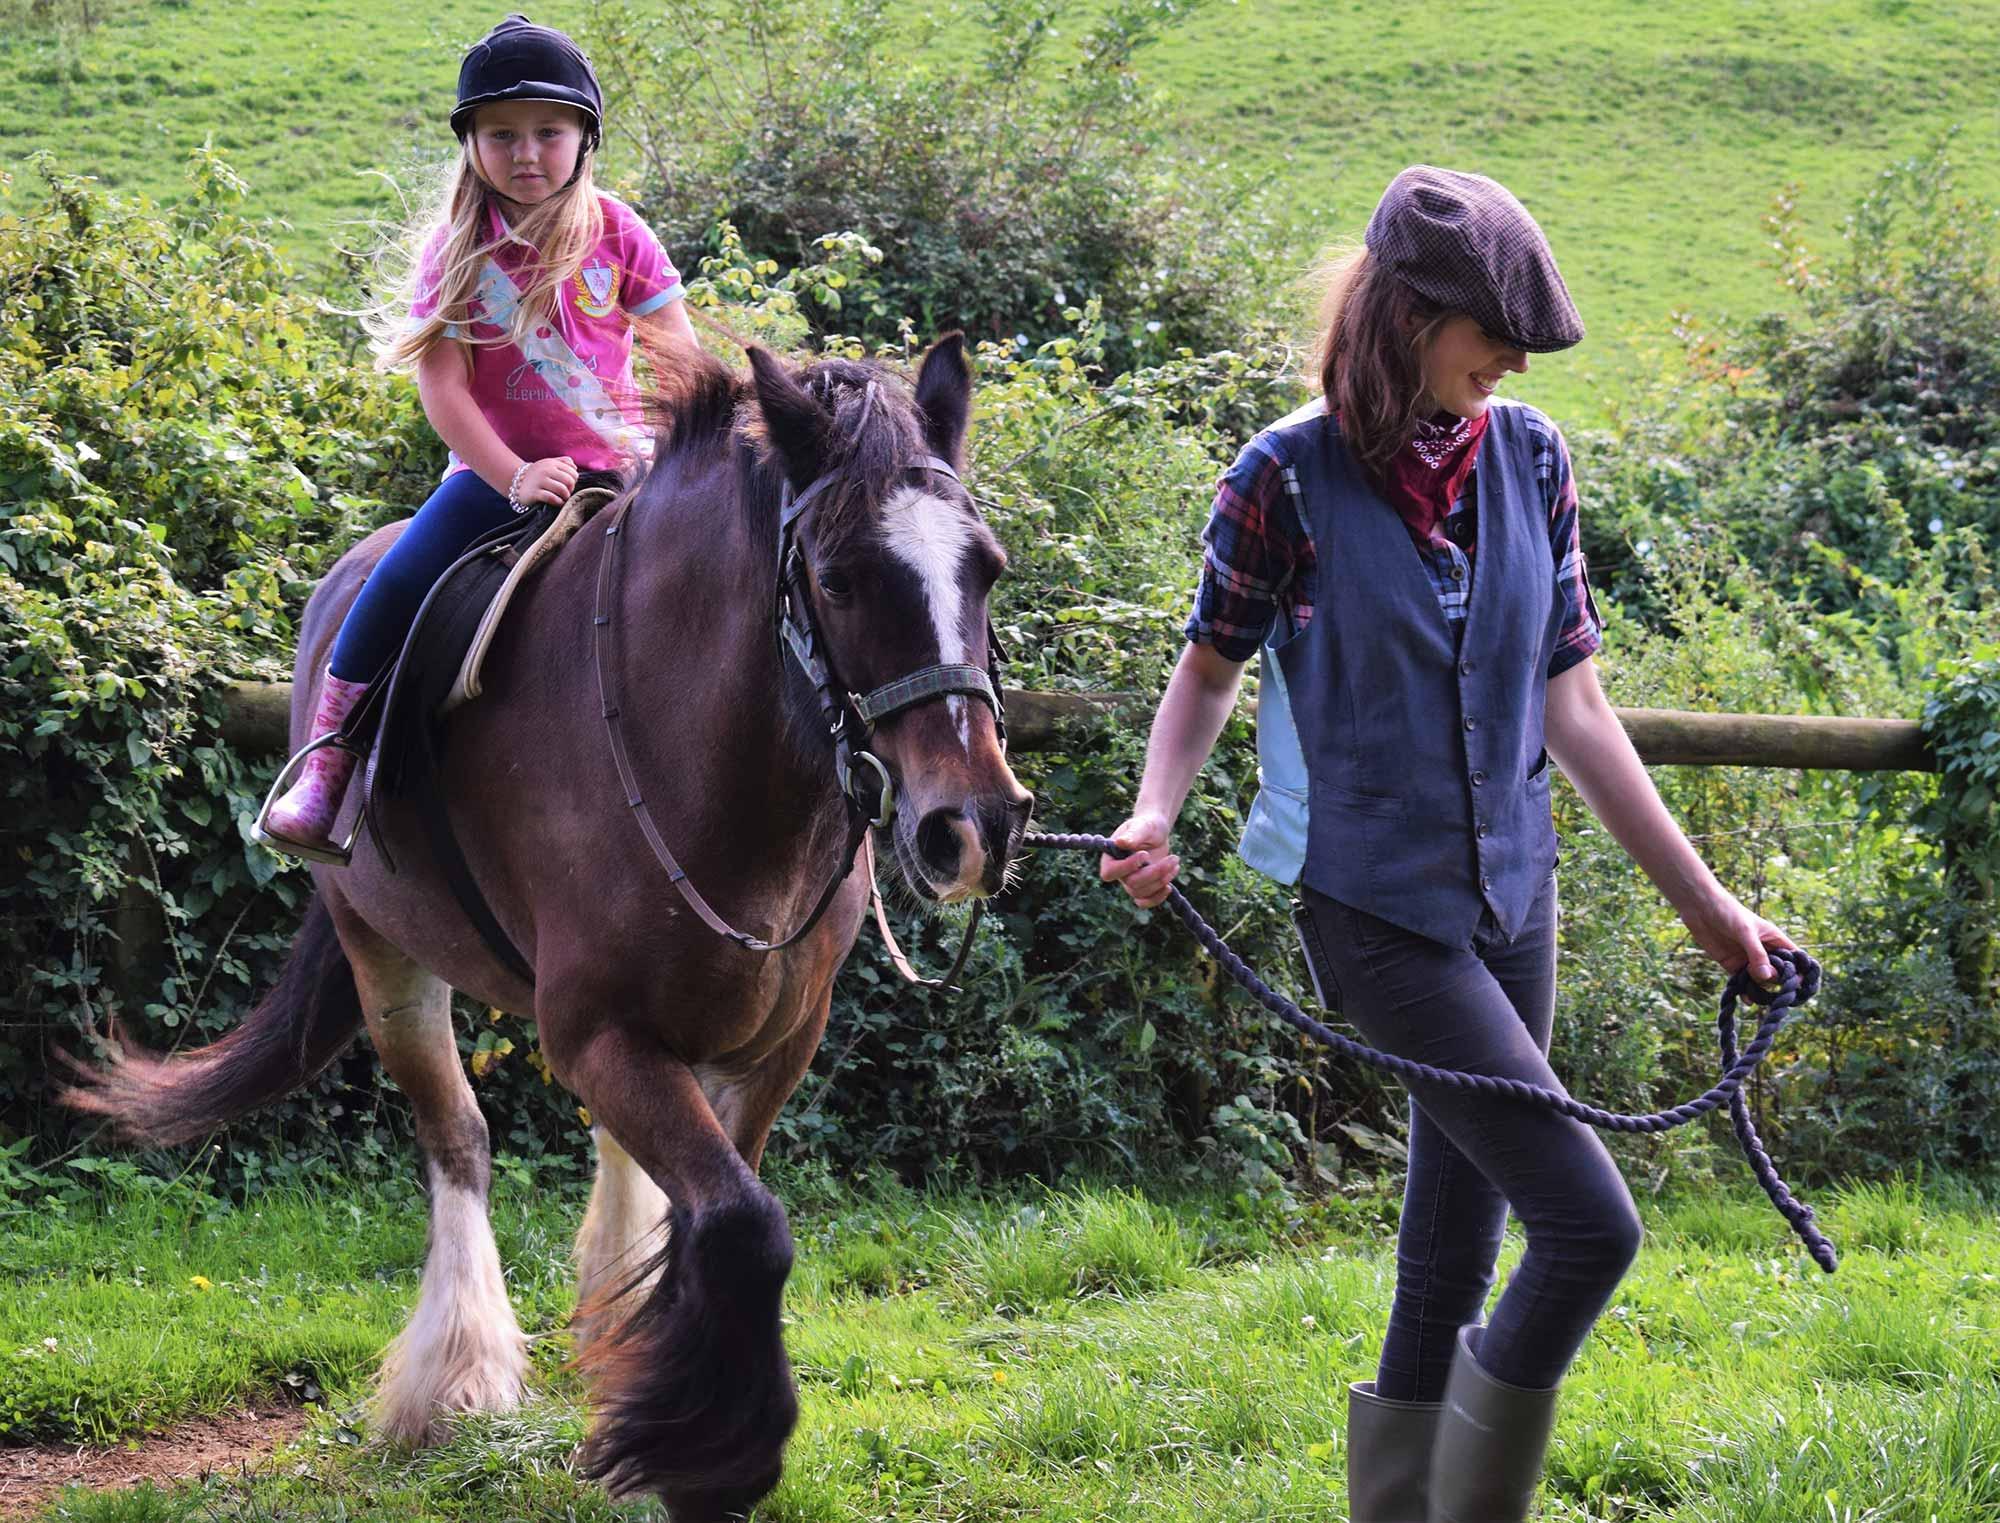 Kids horse riding at Dorset Heavy Horse Farm Park